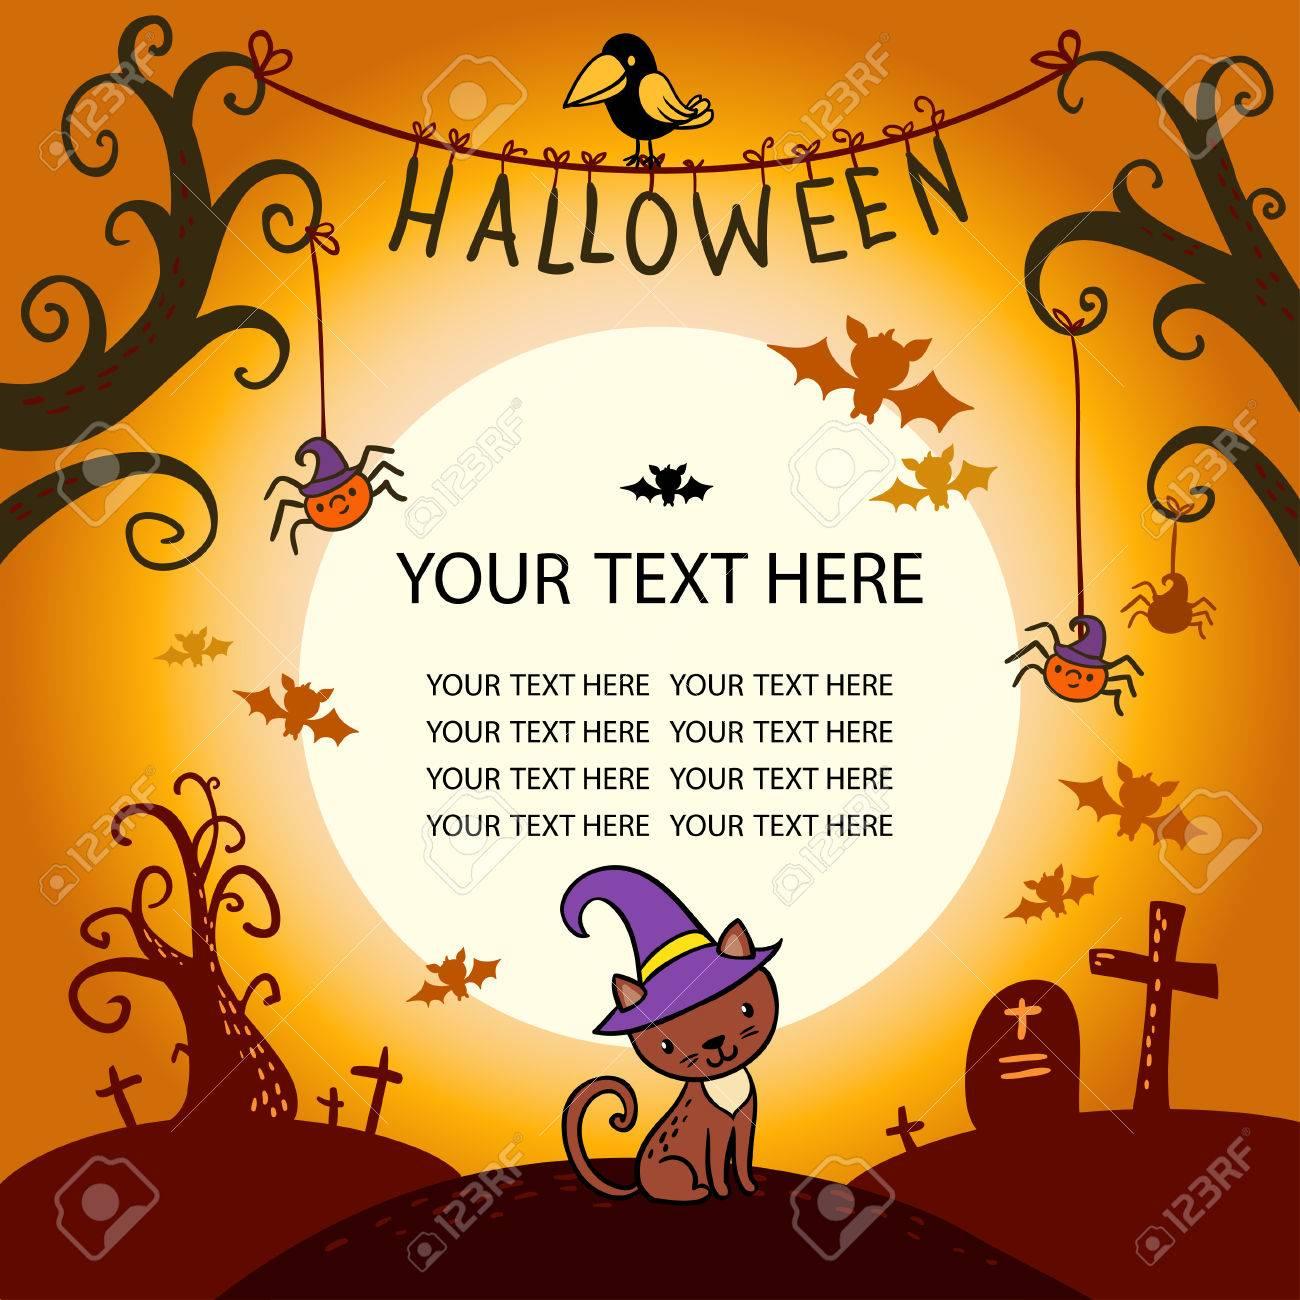 Halloween border for design in a children's style. - 44705209